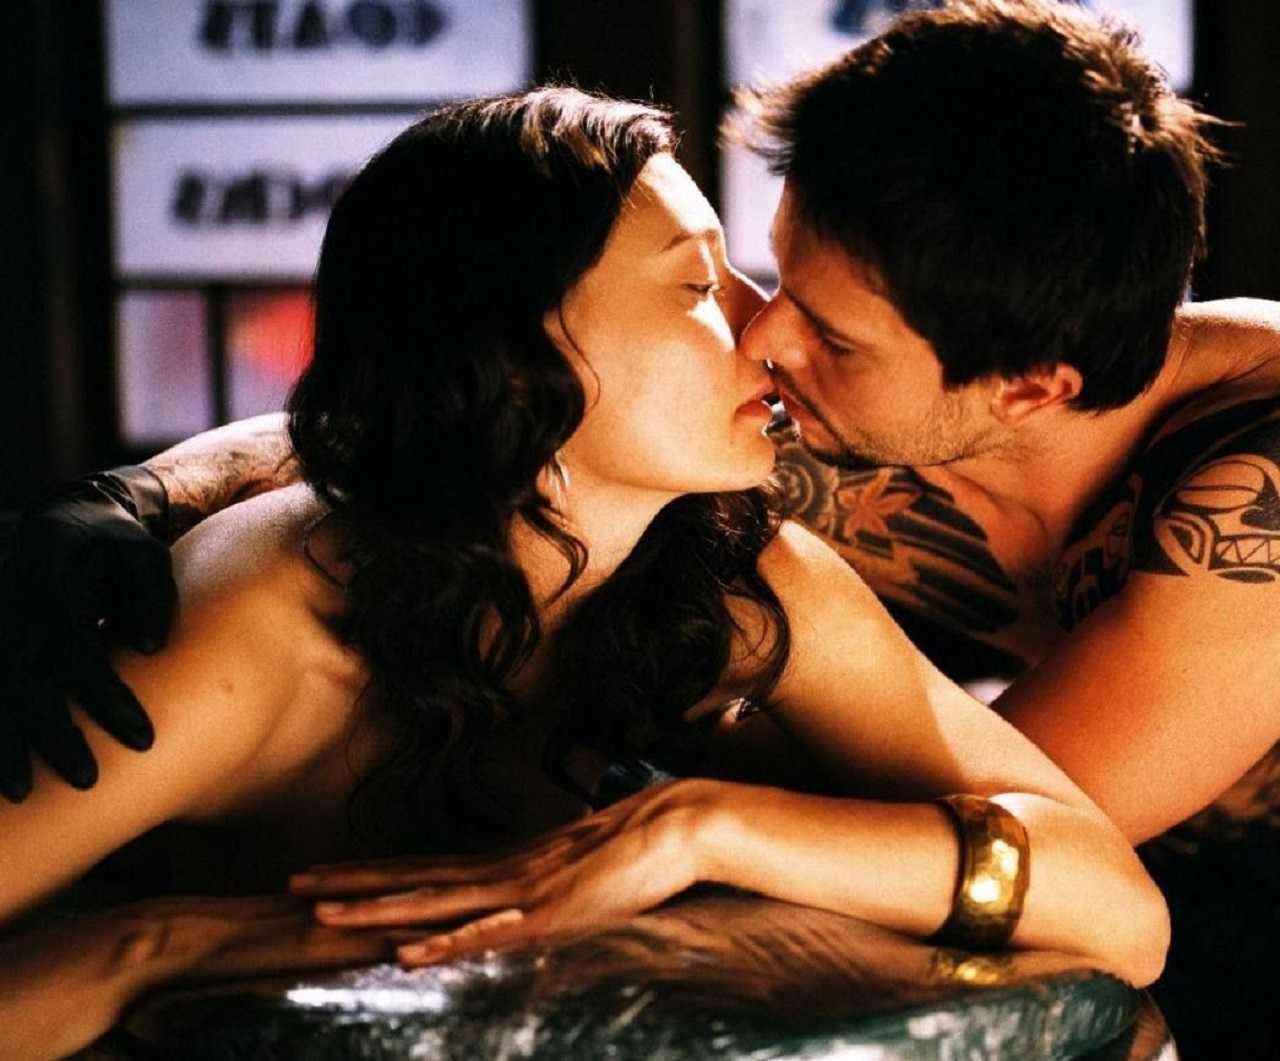 Jason Behr and Mia Blake in The Tattooist (2007)